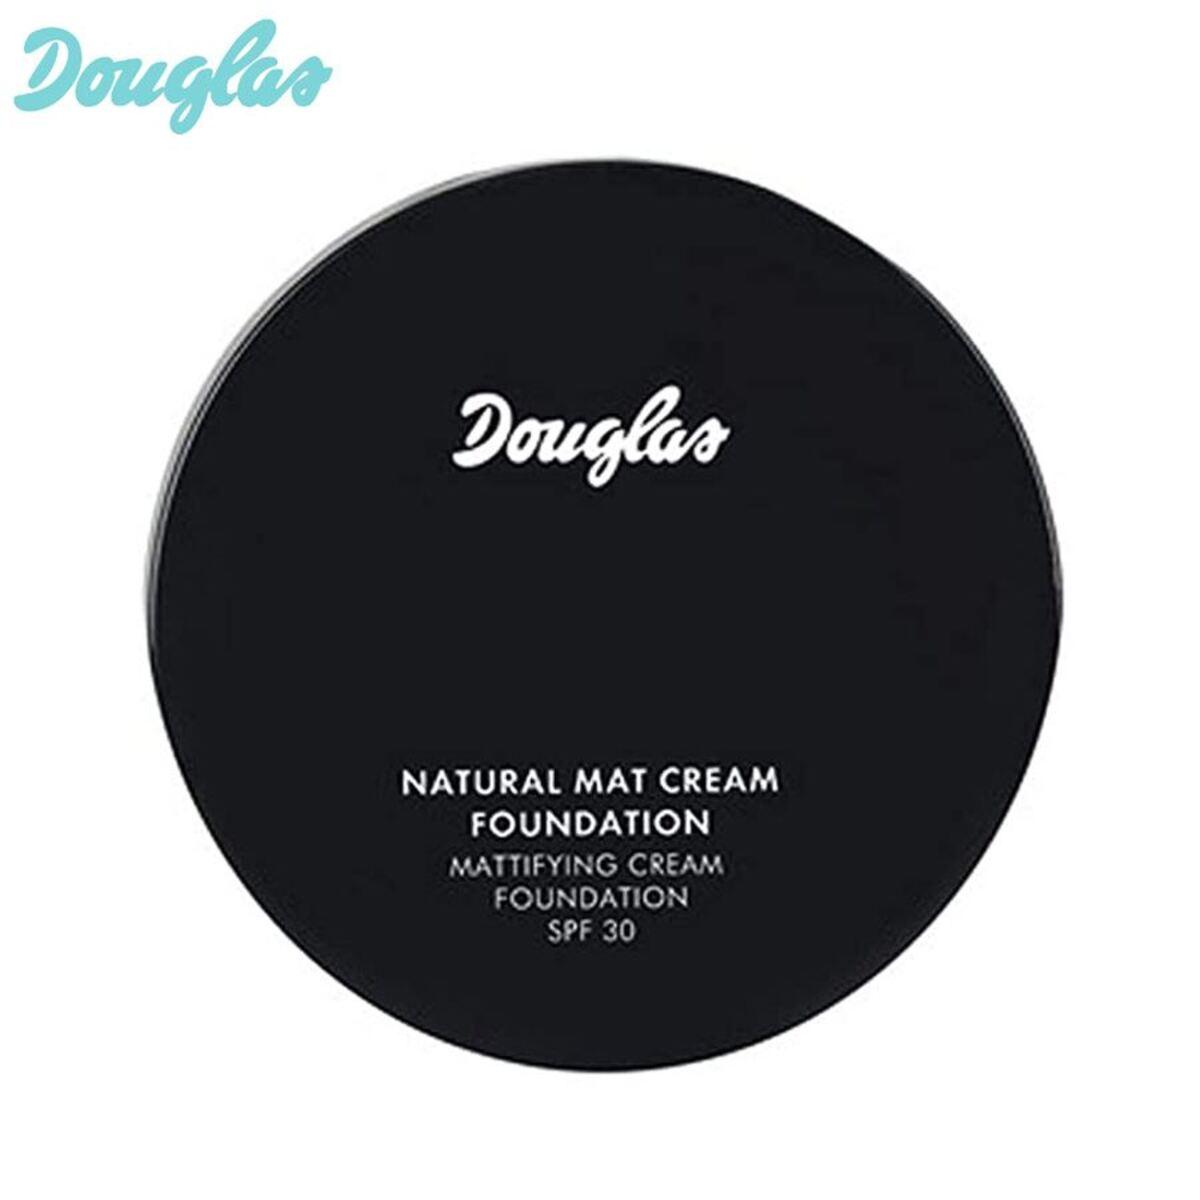 Bild 2 von Douglas Natural Mat Cream Foundation Nr. 1 Nude Addiction 11g